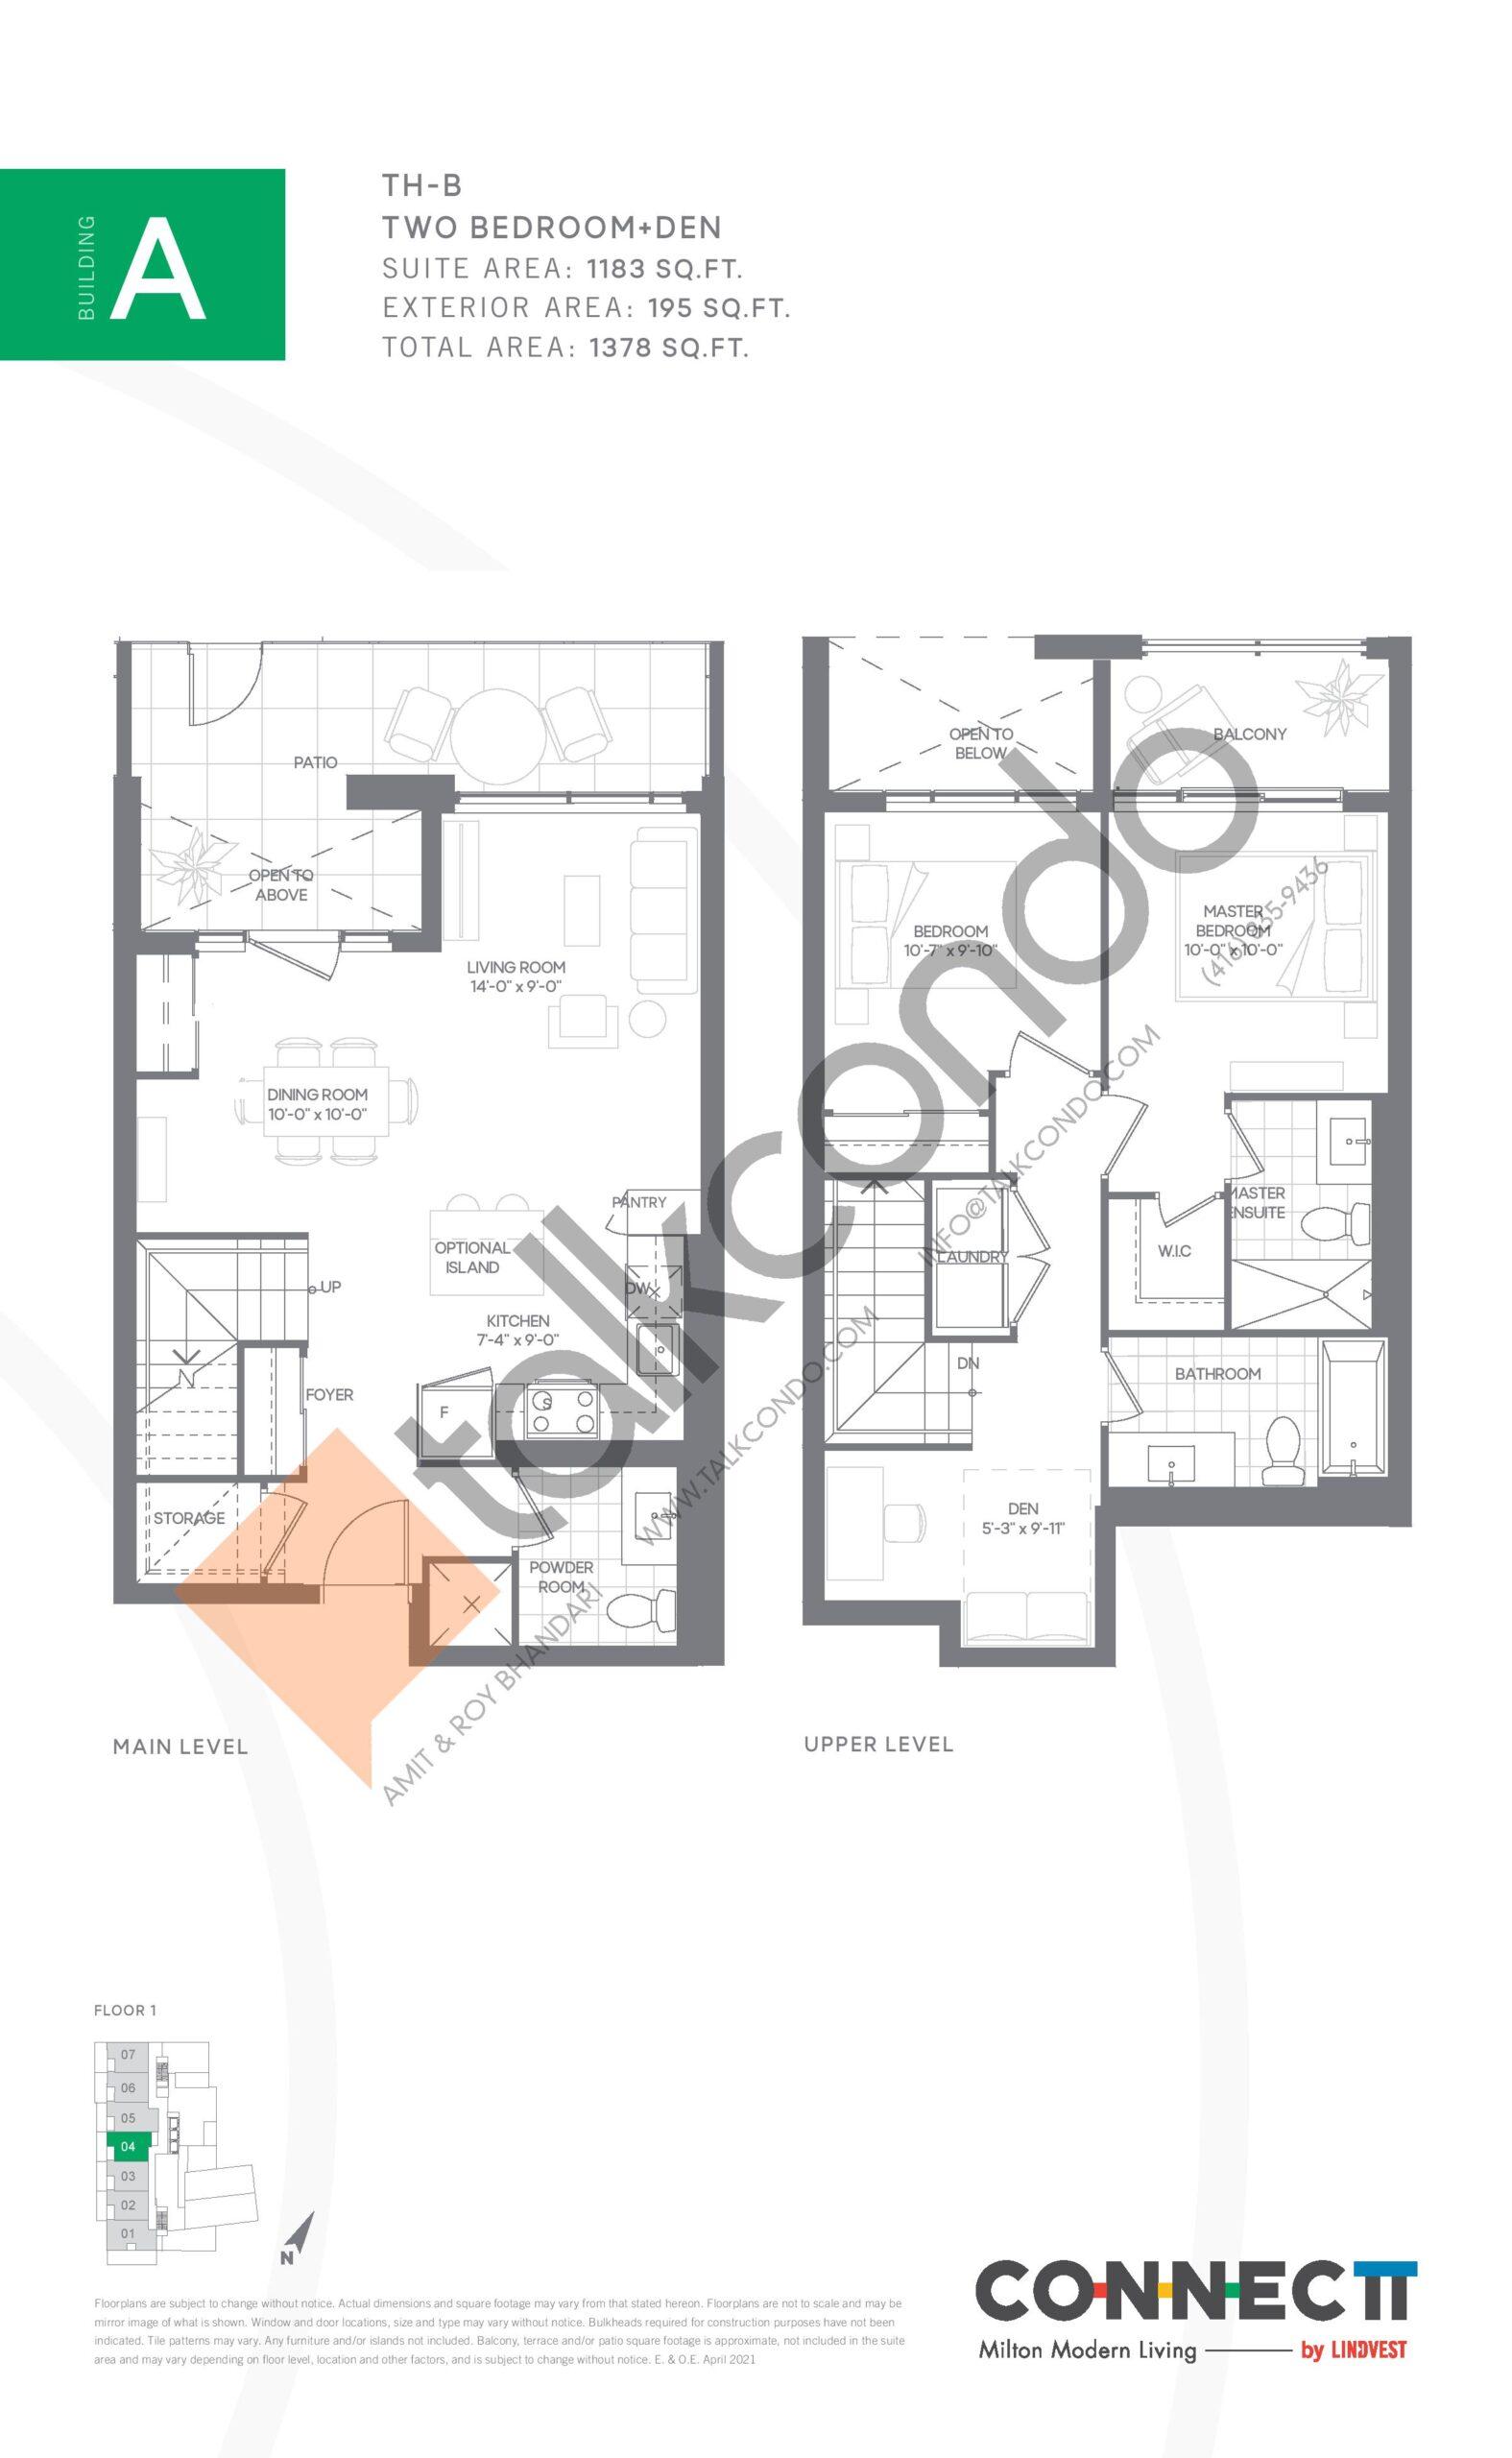 TH-B Floor Plan at Connectt Urban Community Condos - 1183 sq.ft